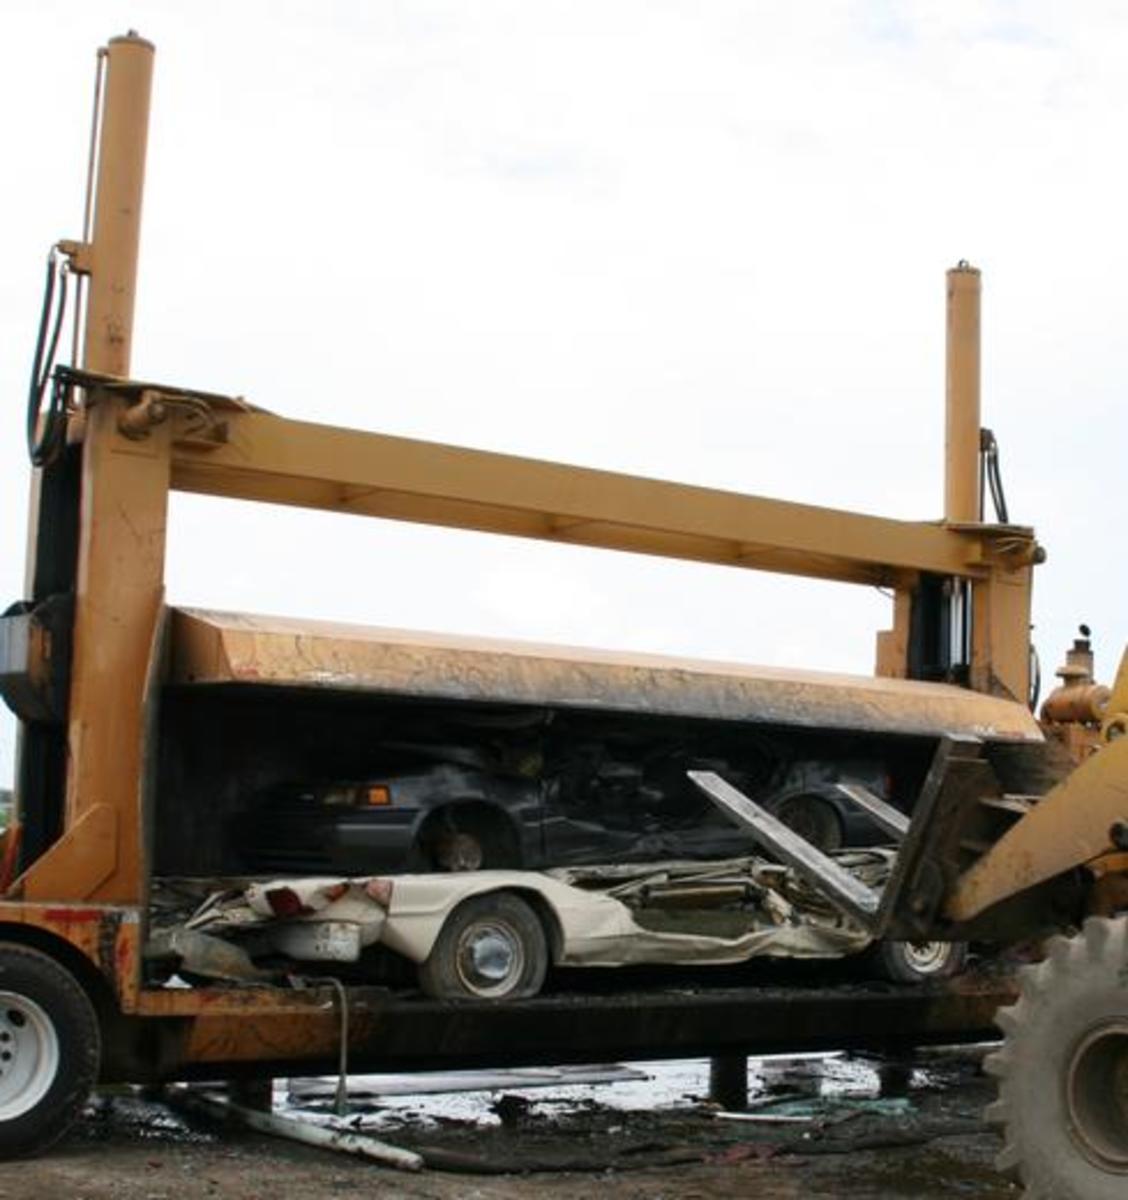 hydraulic press crushing cars